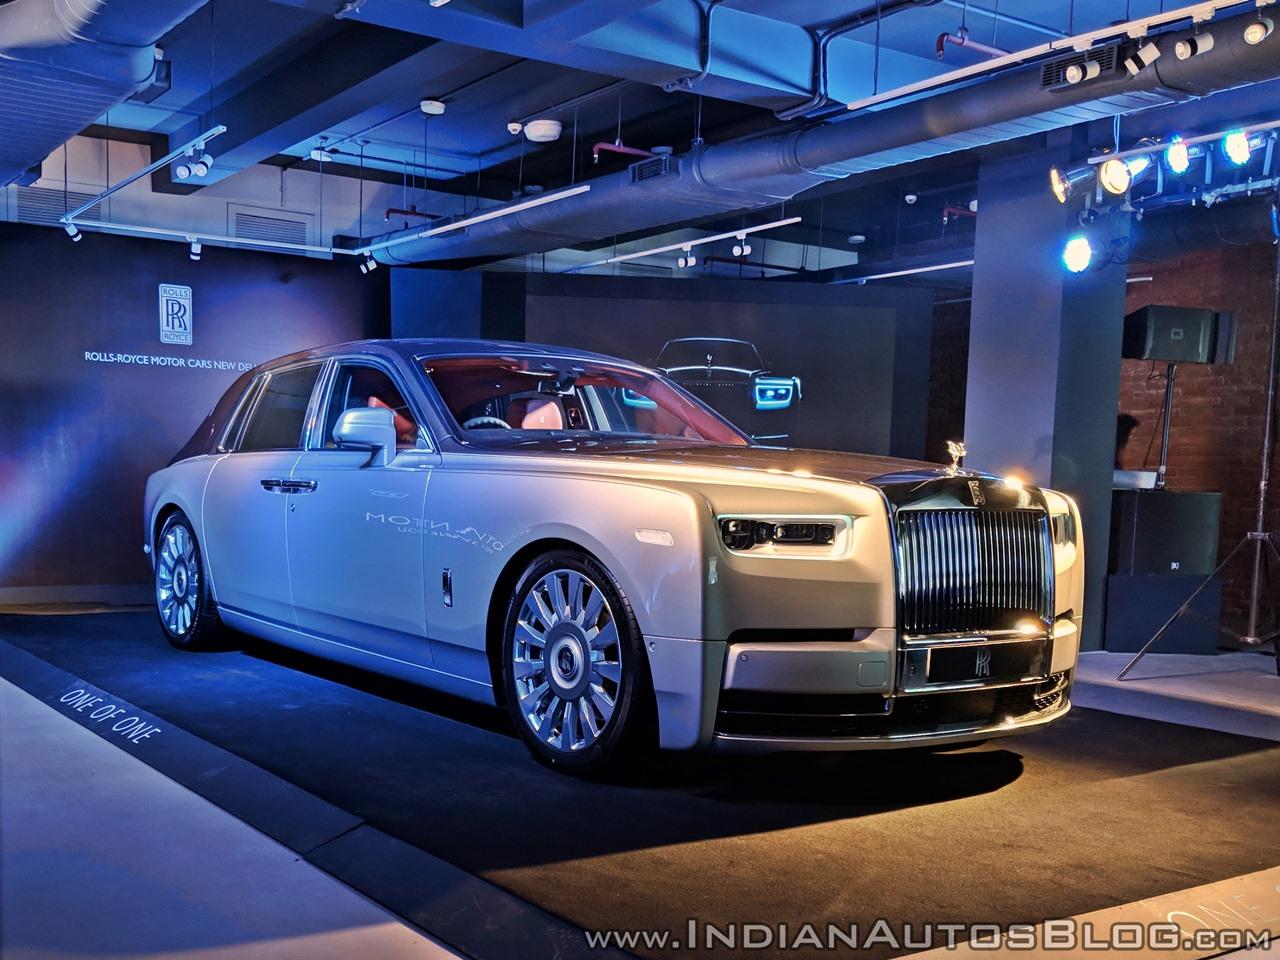 2018 Rolls Royce Phantom priced from INR 9.5 Crore in India